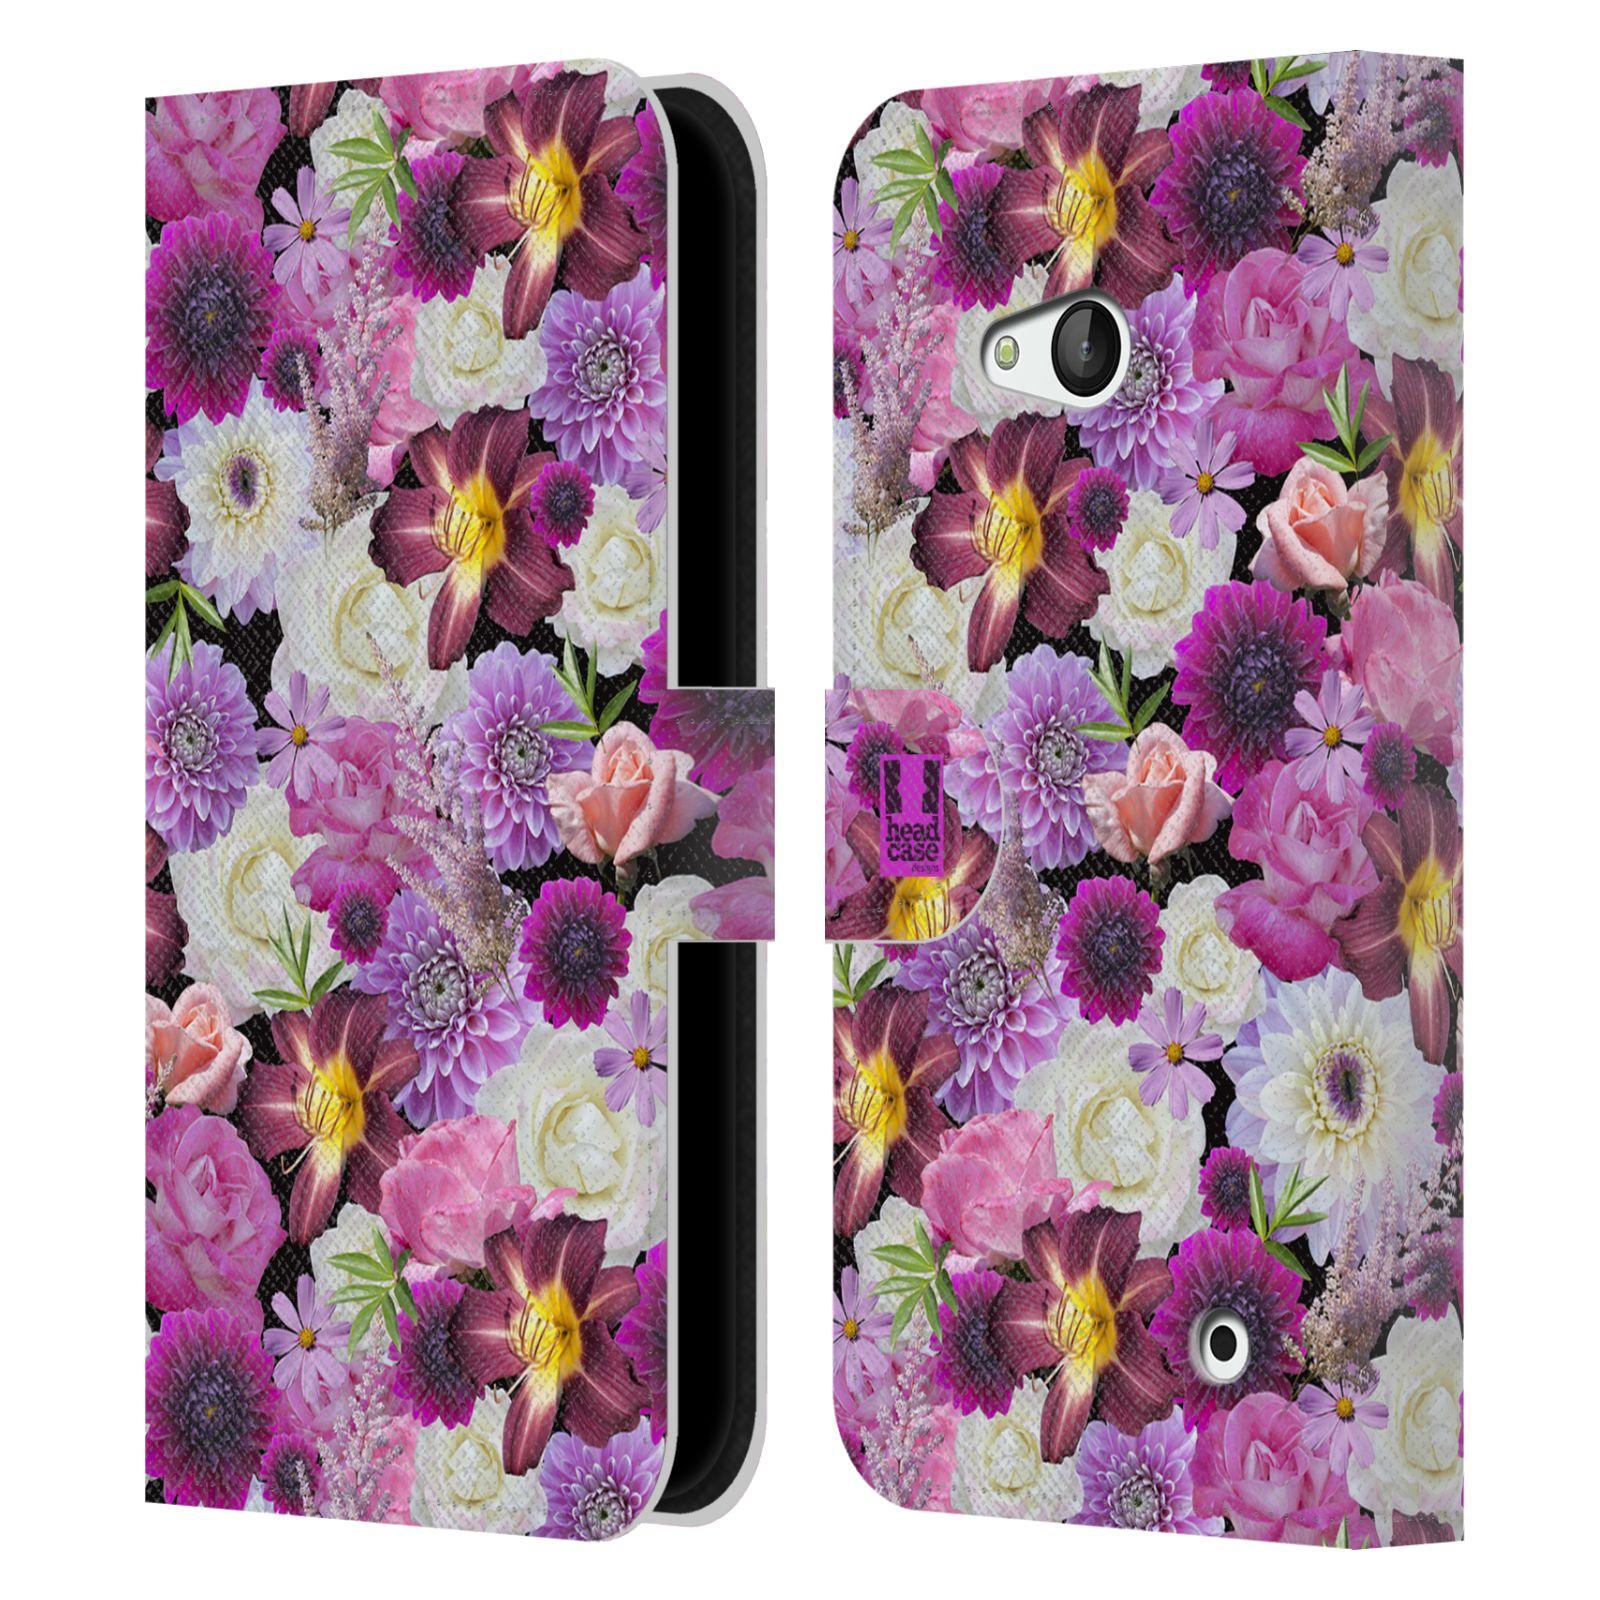 HEAD CASE Flipové pouzdro pro mobil NOKIA / MICROSOFT LUMIA 640 / LUMIA 640 DUAL květy foto fialová a bílá